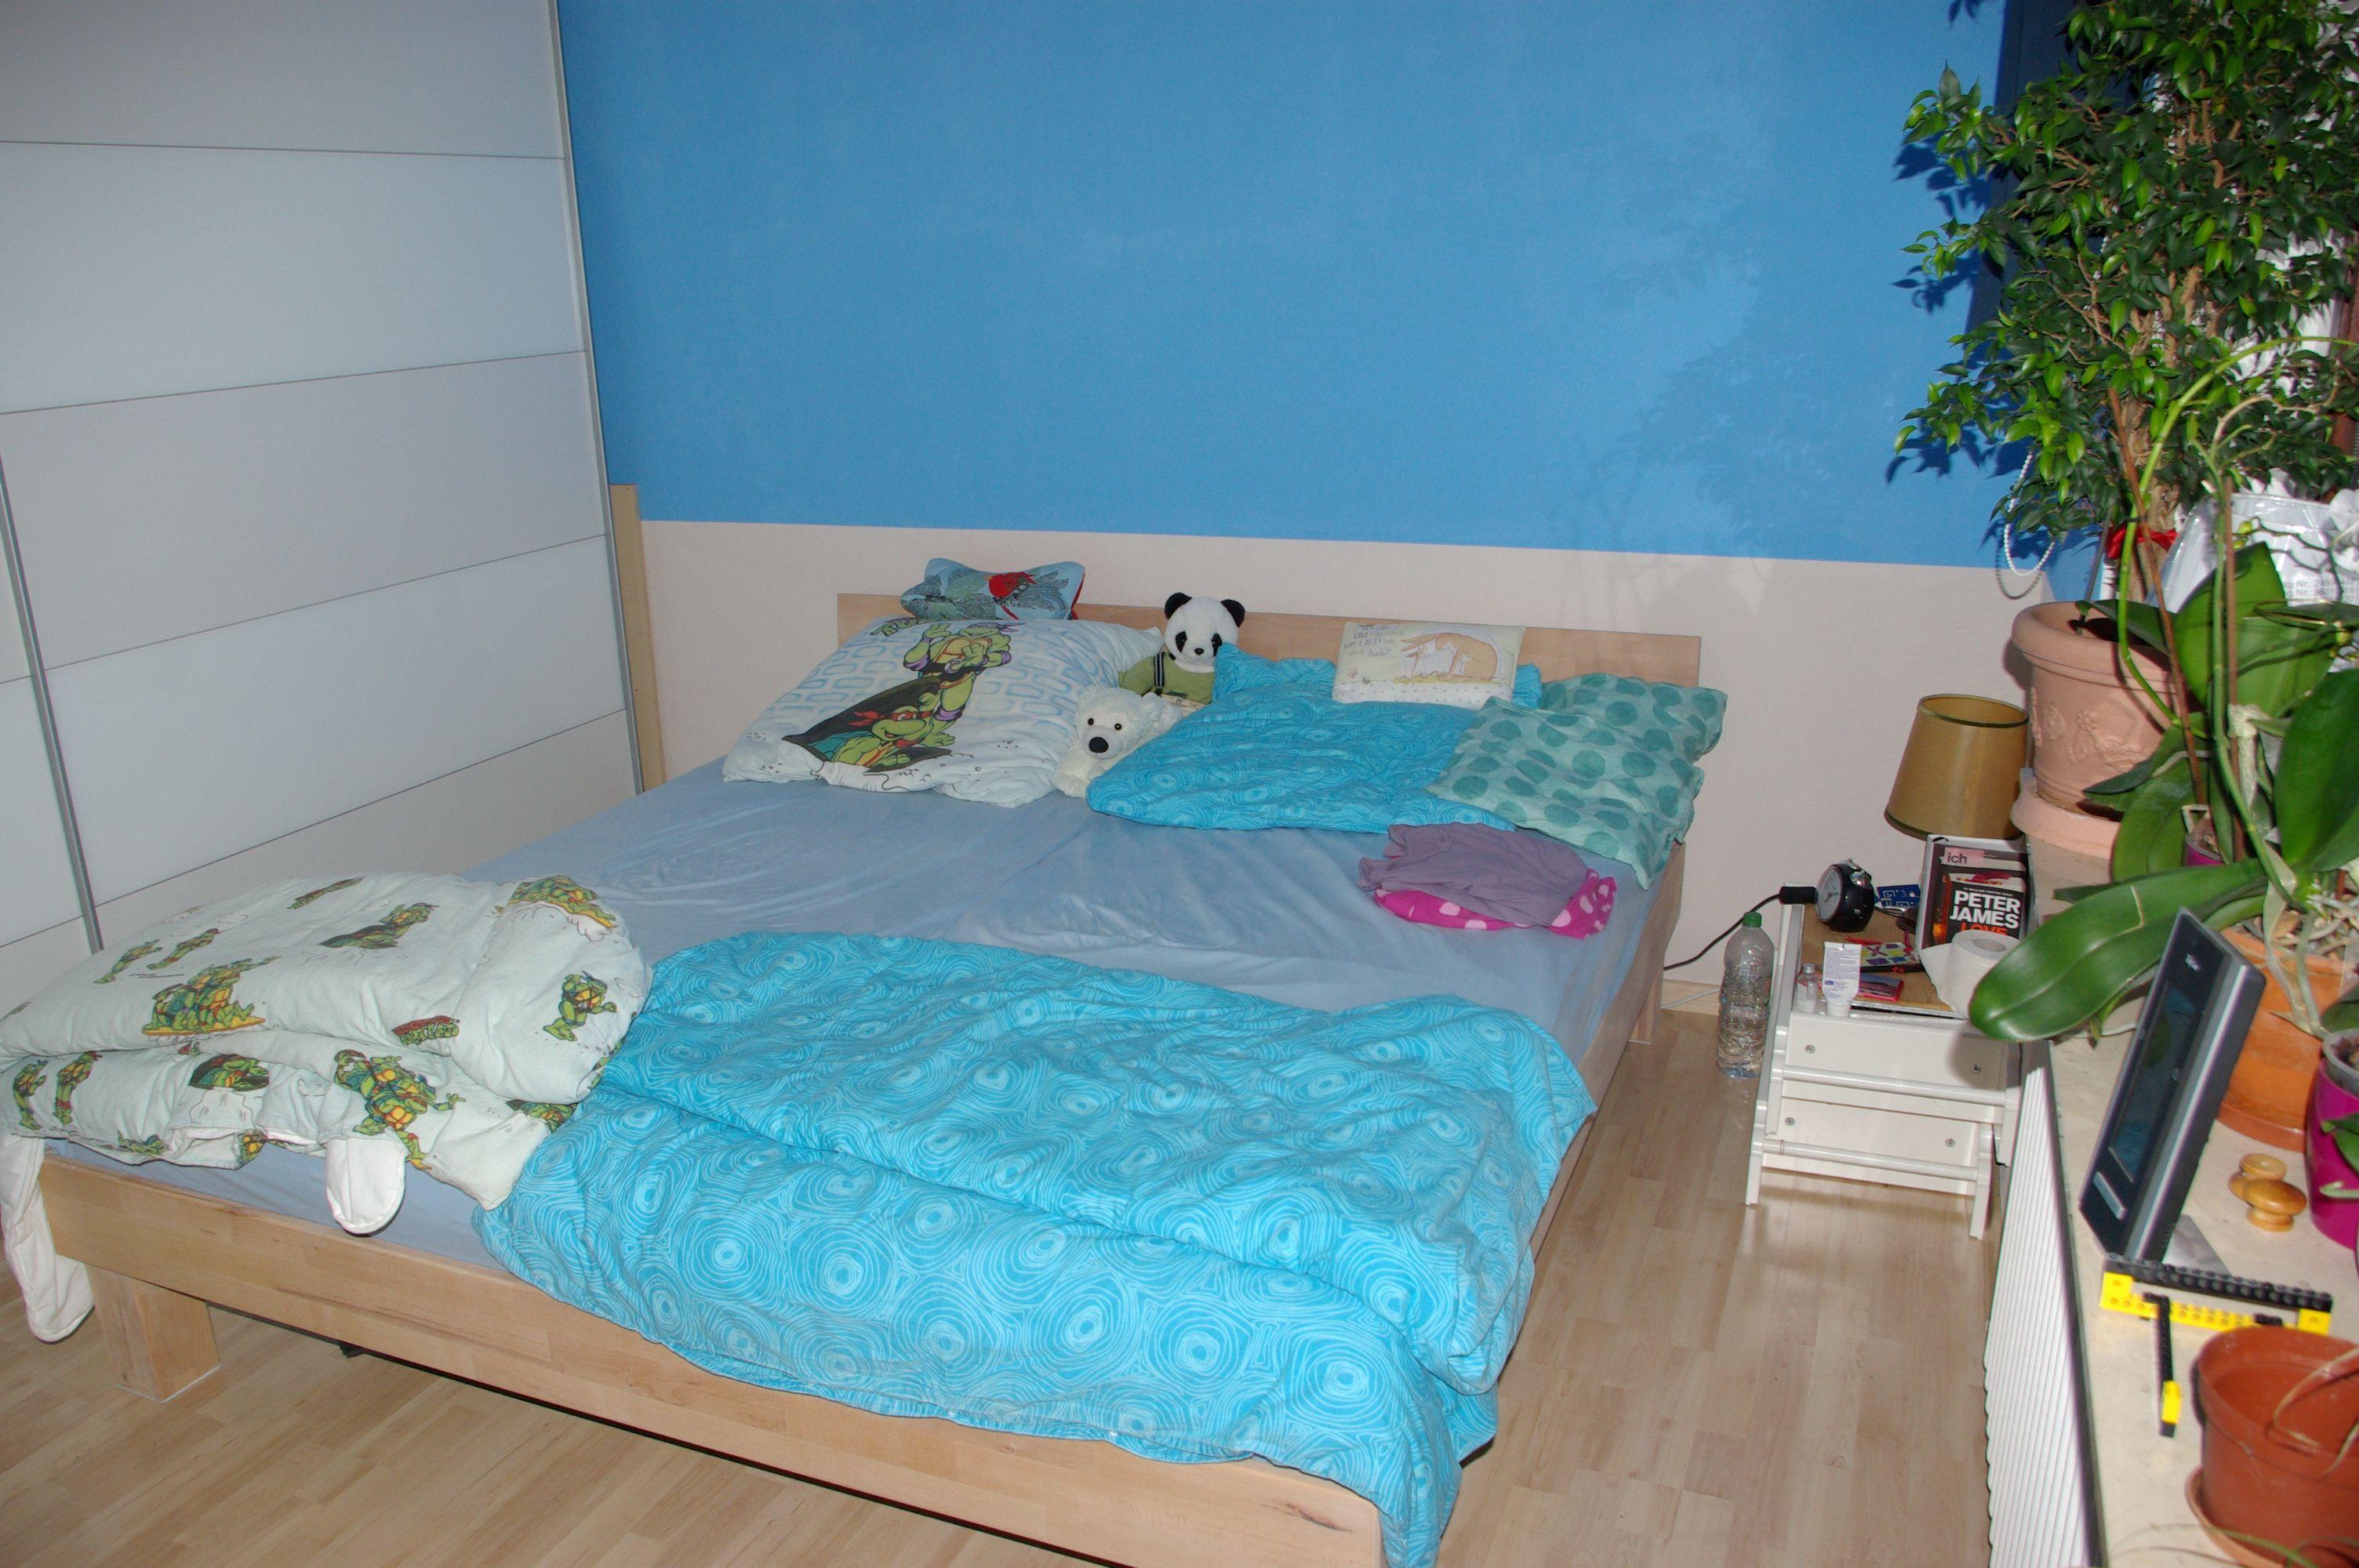 Unser Neues Bett Massivholzbett Areswood Inkl Latenroste Und Matratzen Die Bodyguard Anti Kartell Matratzen Von Bett1 Massivholzbett Bett